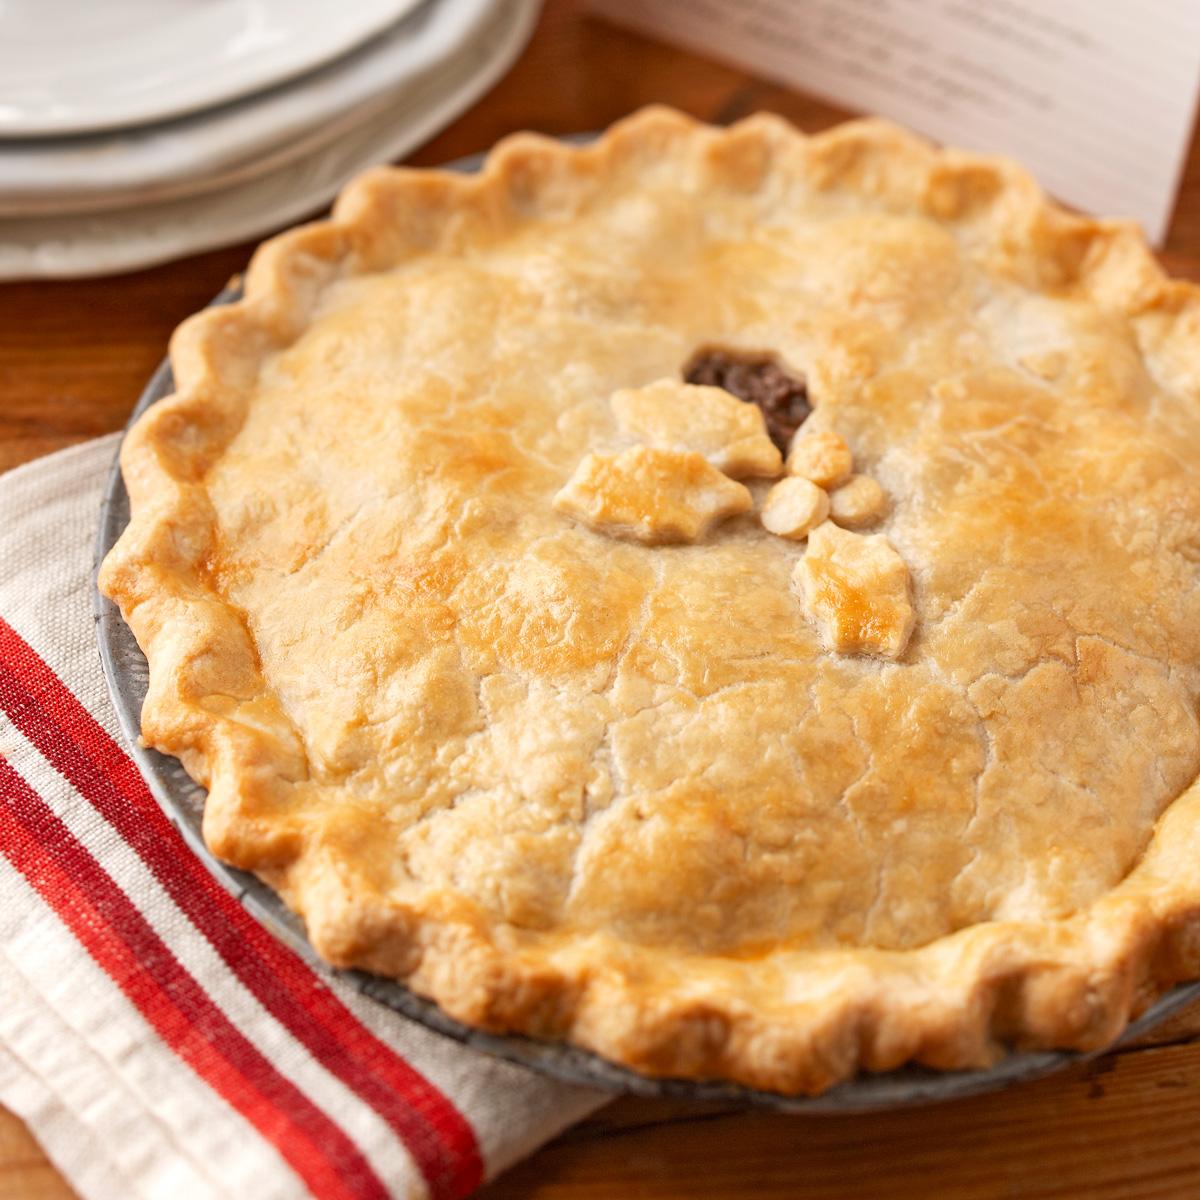 Kathy's Meat Pie